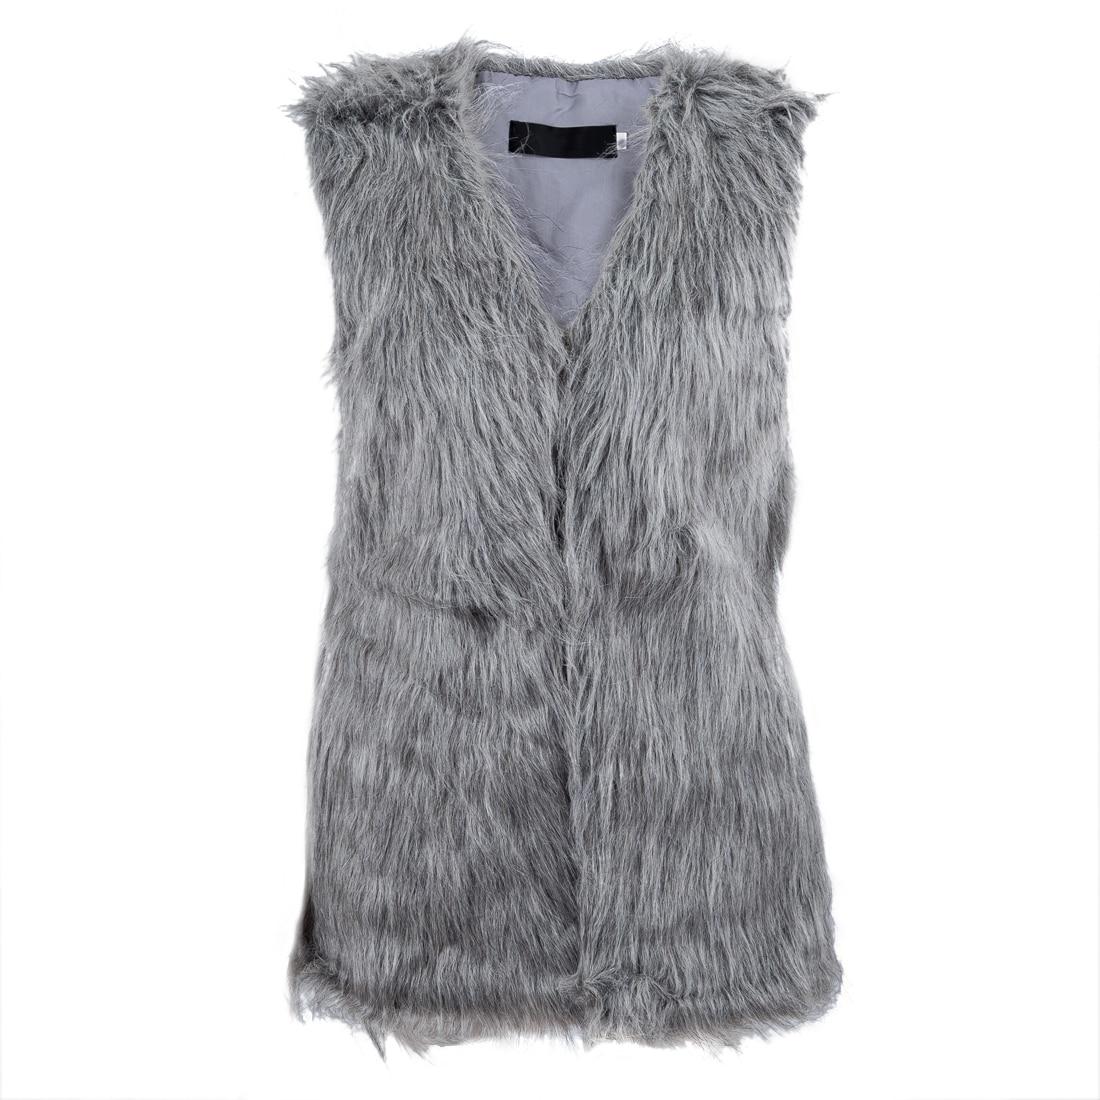 e195bda83cc227 Mulheres da Pele Do Falso GiletMid-longo Outwear Colete - skin care us95